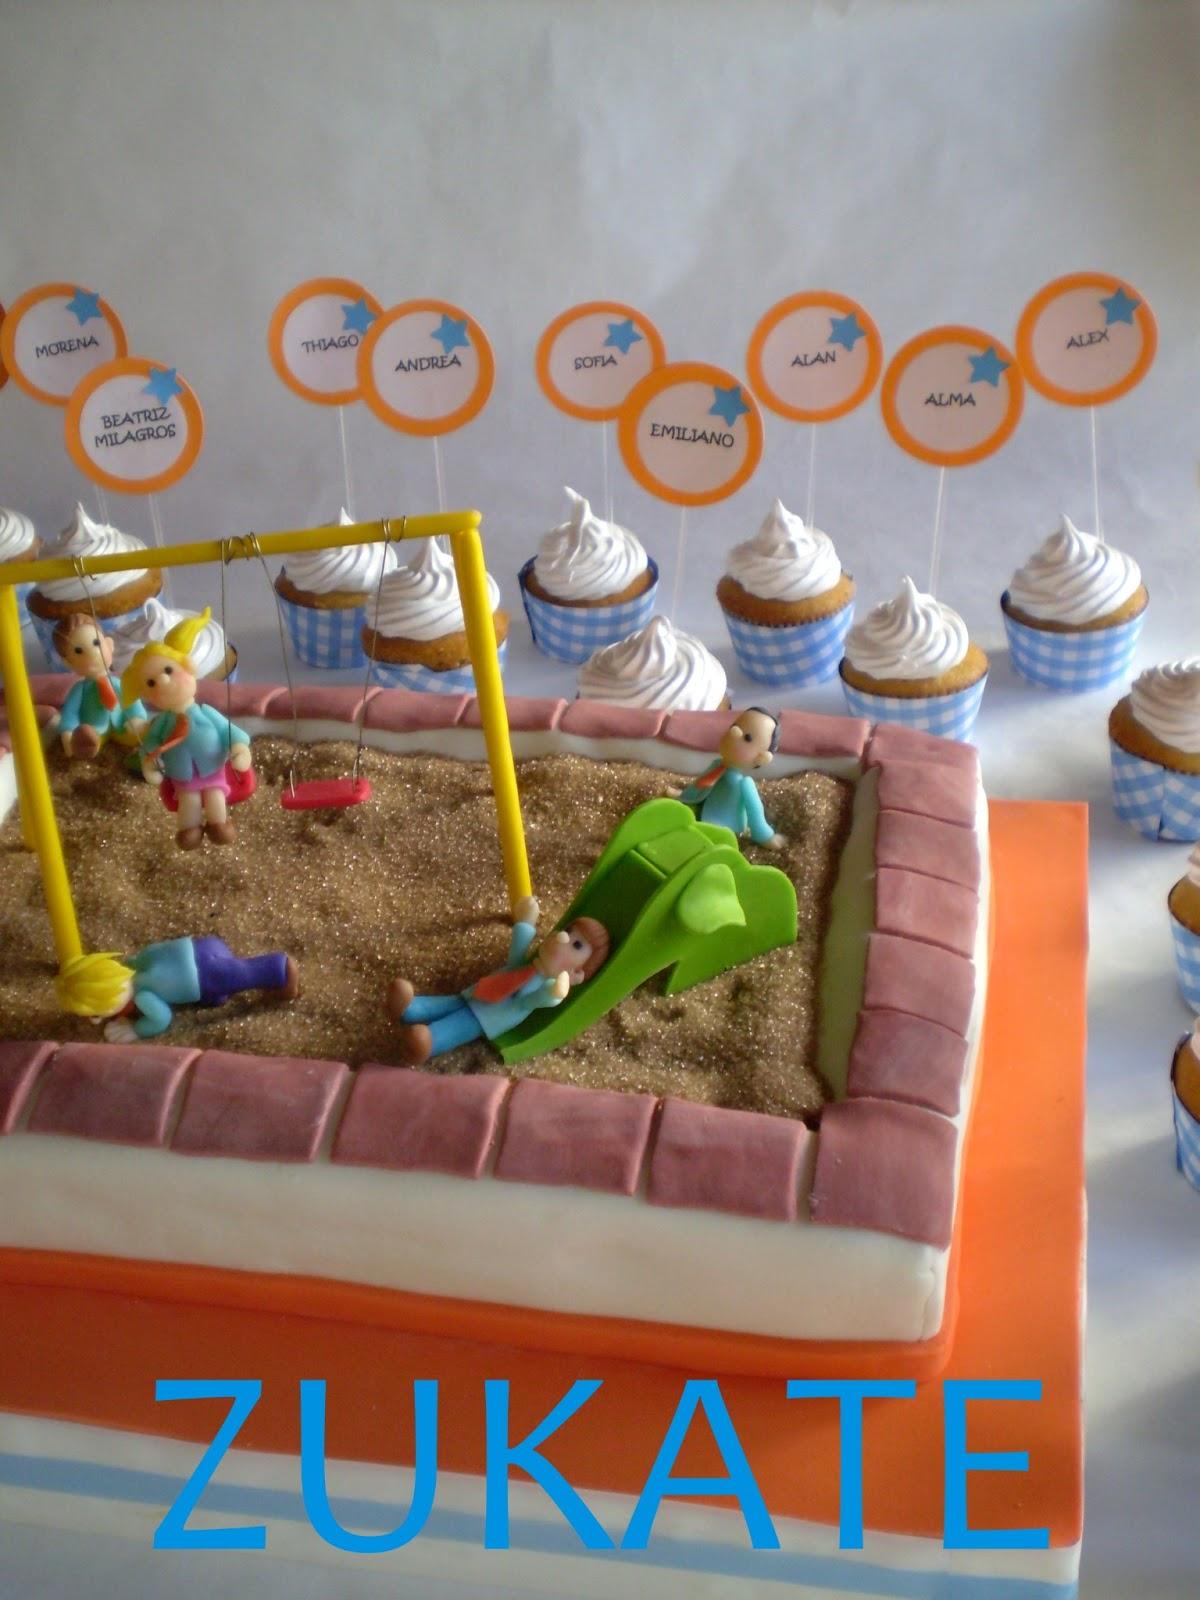 Torta egresaditos jardin de infantes zukate for Jardin de infantes